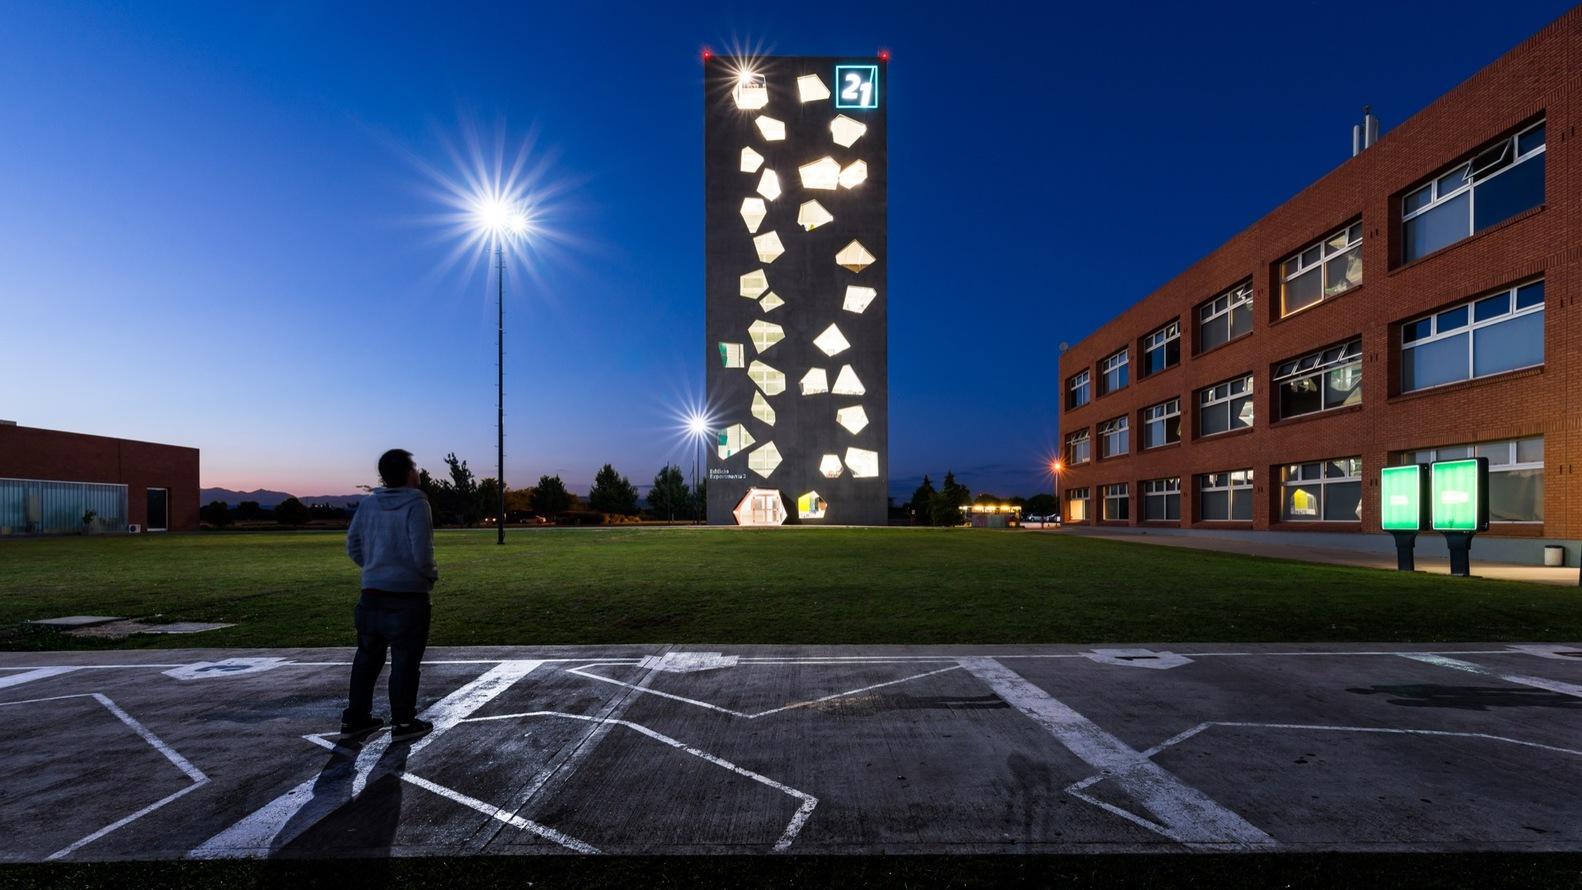 edificio-experimenta-21-mgm-arquitectos-gonzalo-viramonte-06